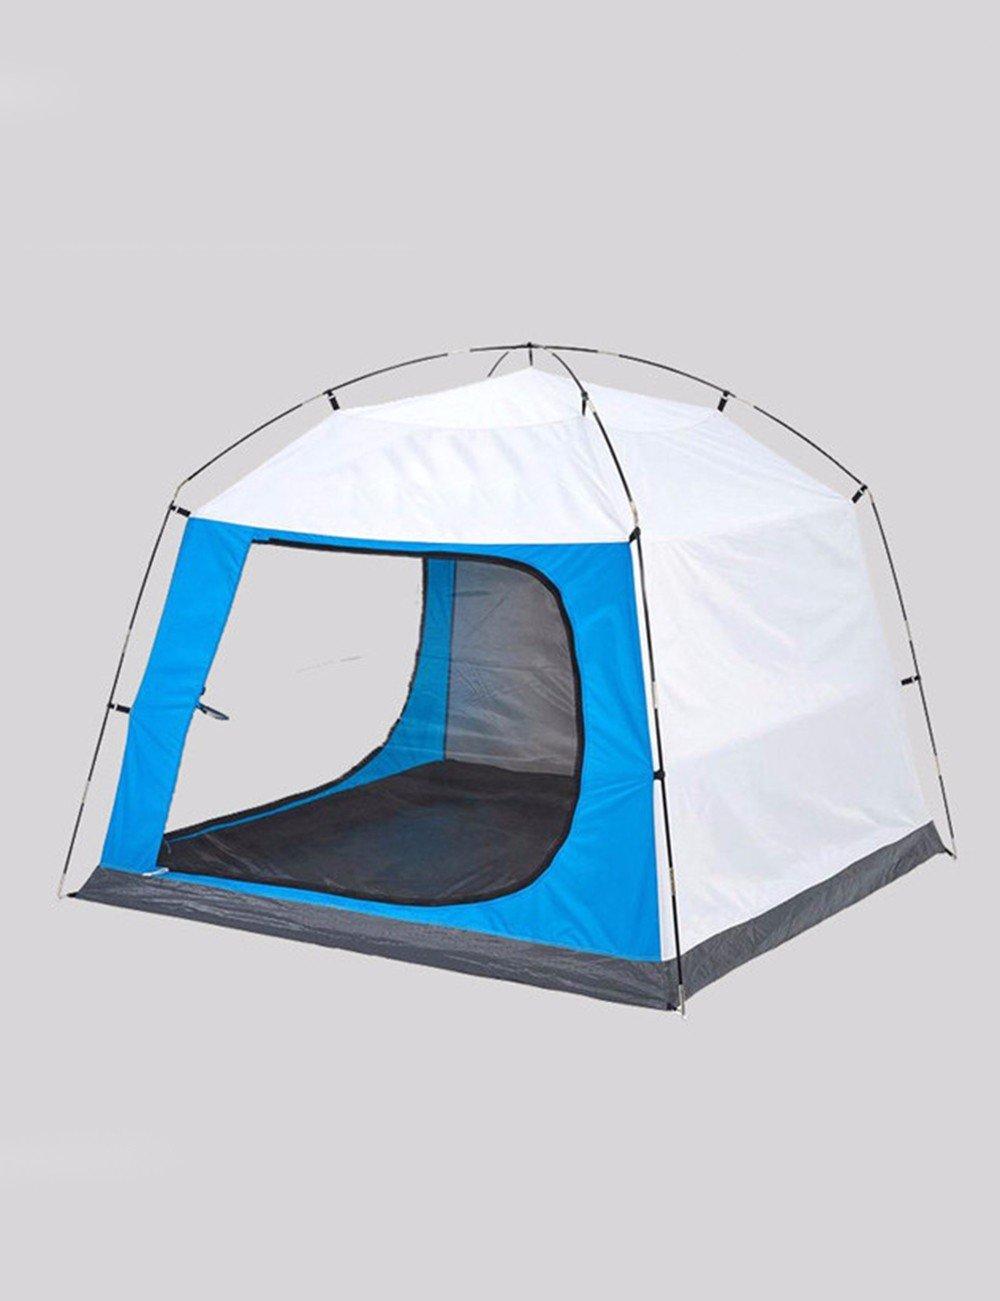 SJQKA-Outdoor Camping 3-4 Personenzelt, Strand Zelt, Vorzelt Zelt, atmungsaktiv Anti-moskito-Sonnencreme Zelt